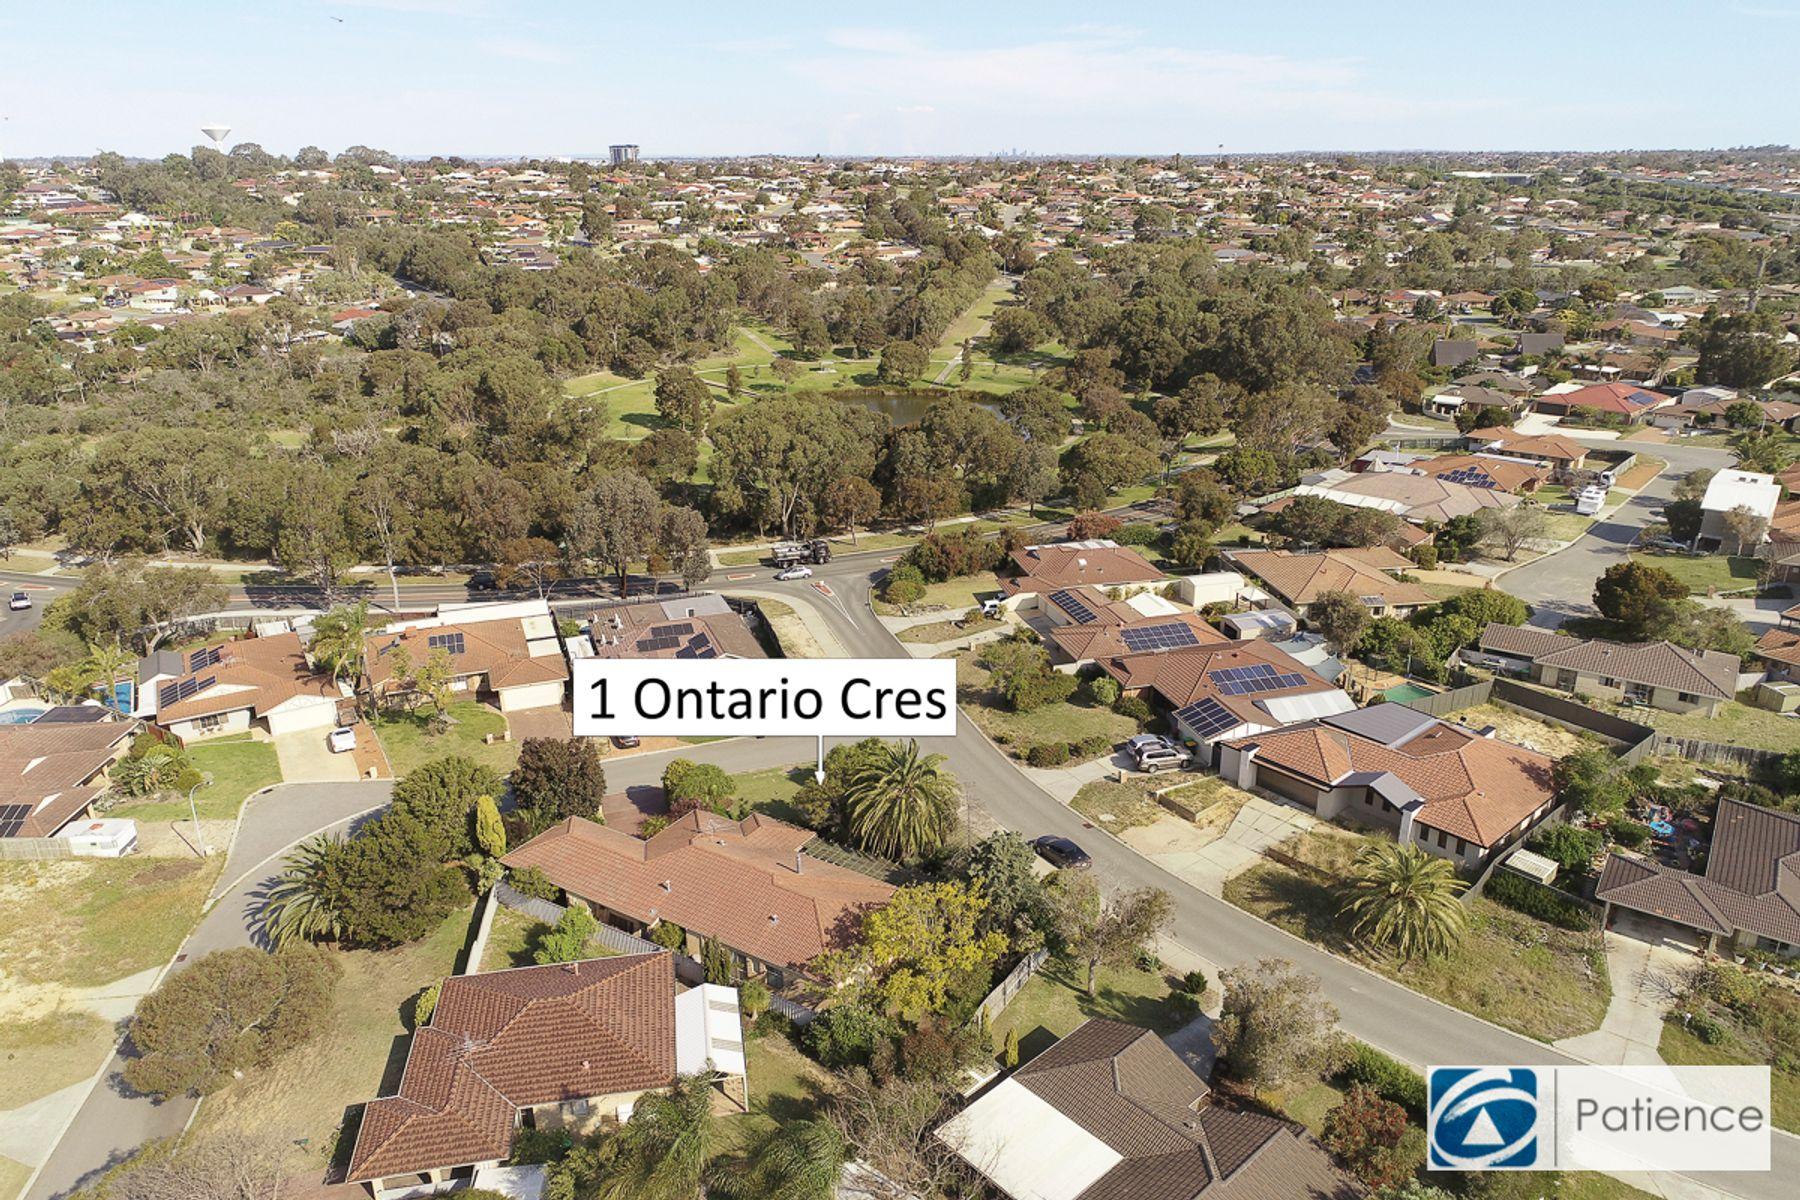 1 Ontario Crescent, Joondalup, WA 6027